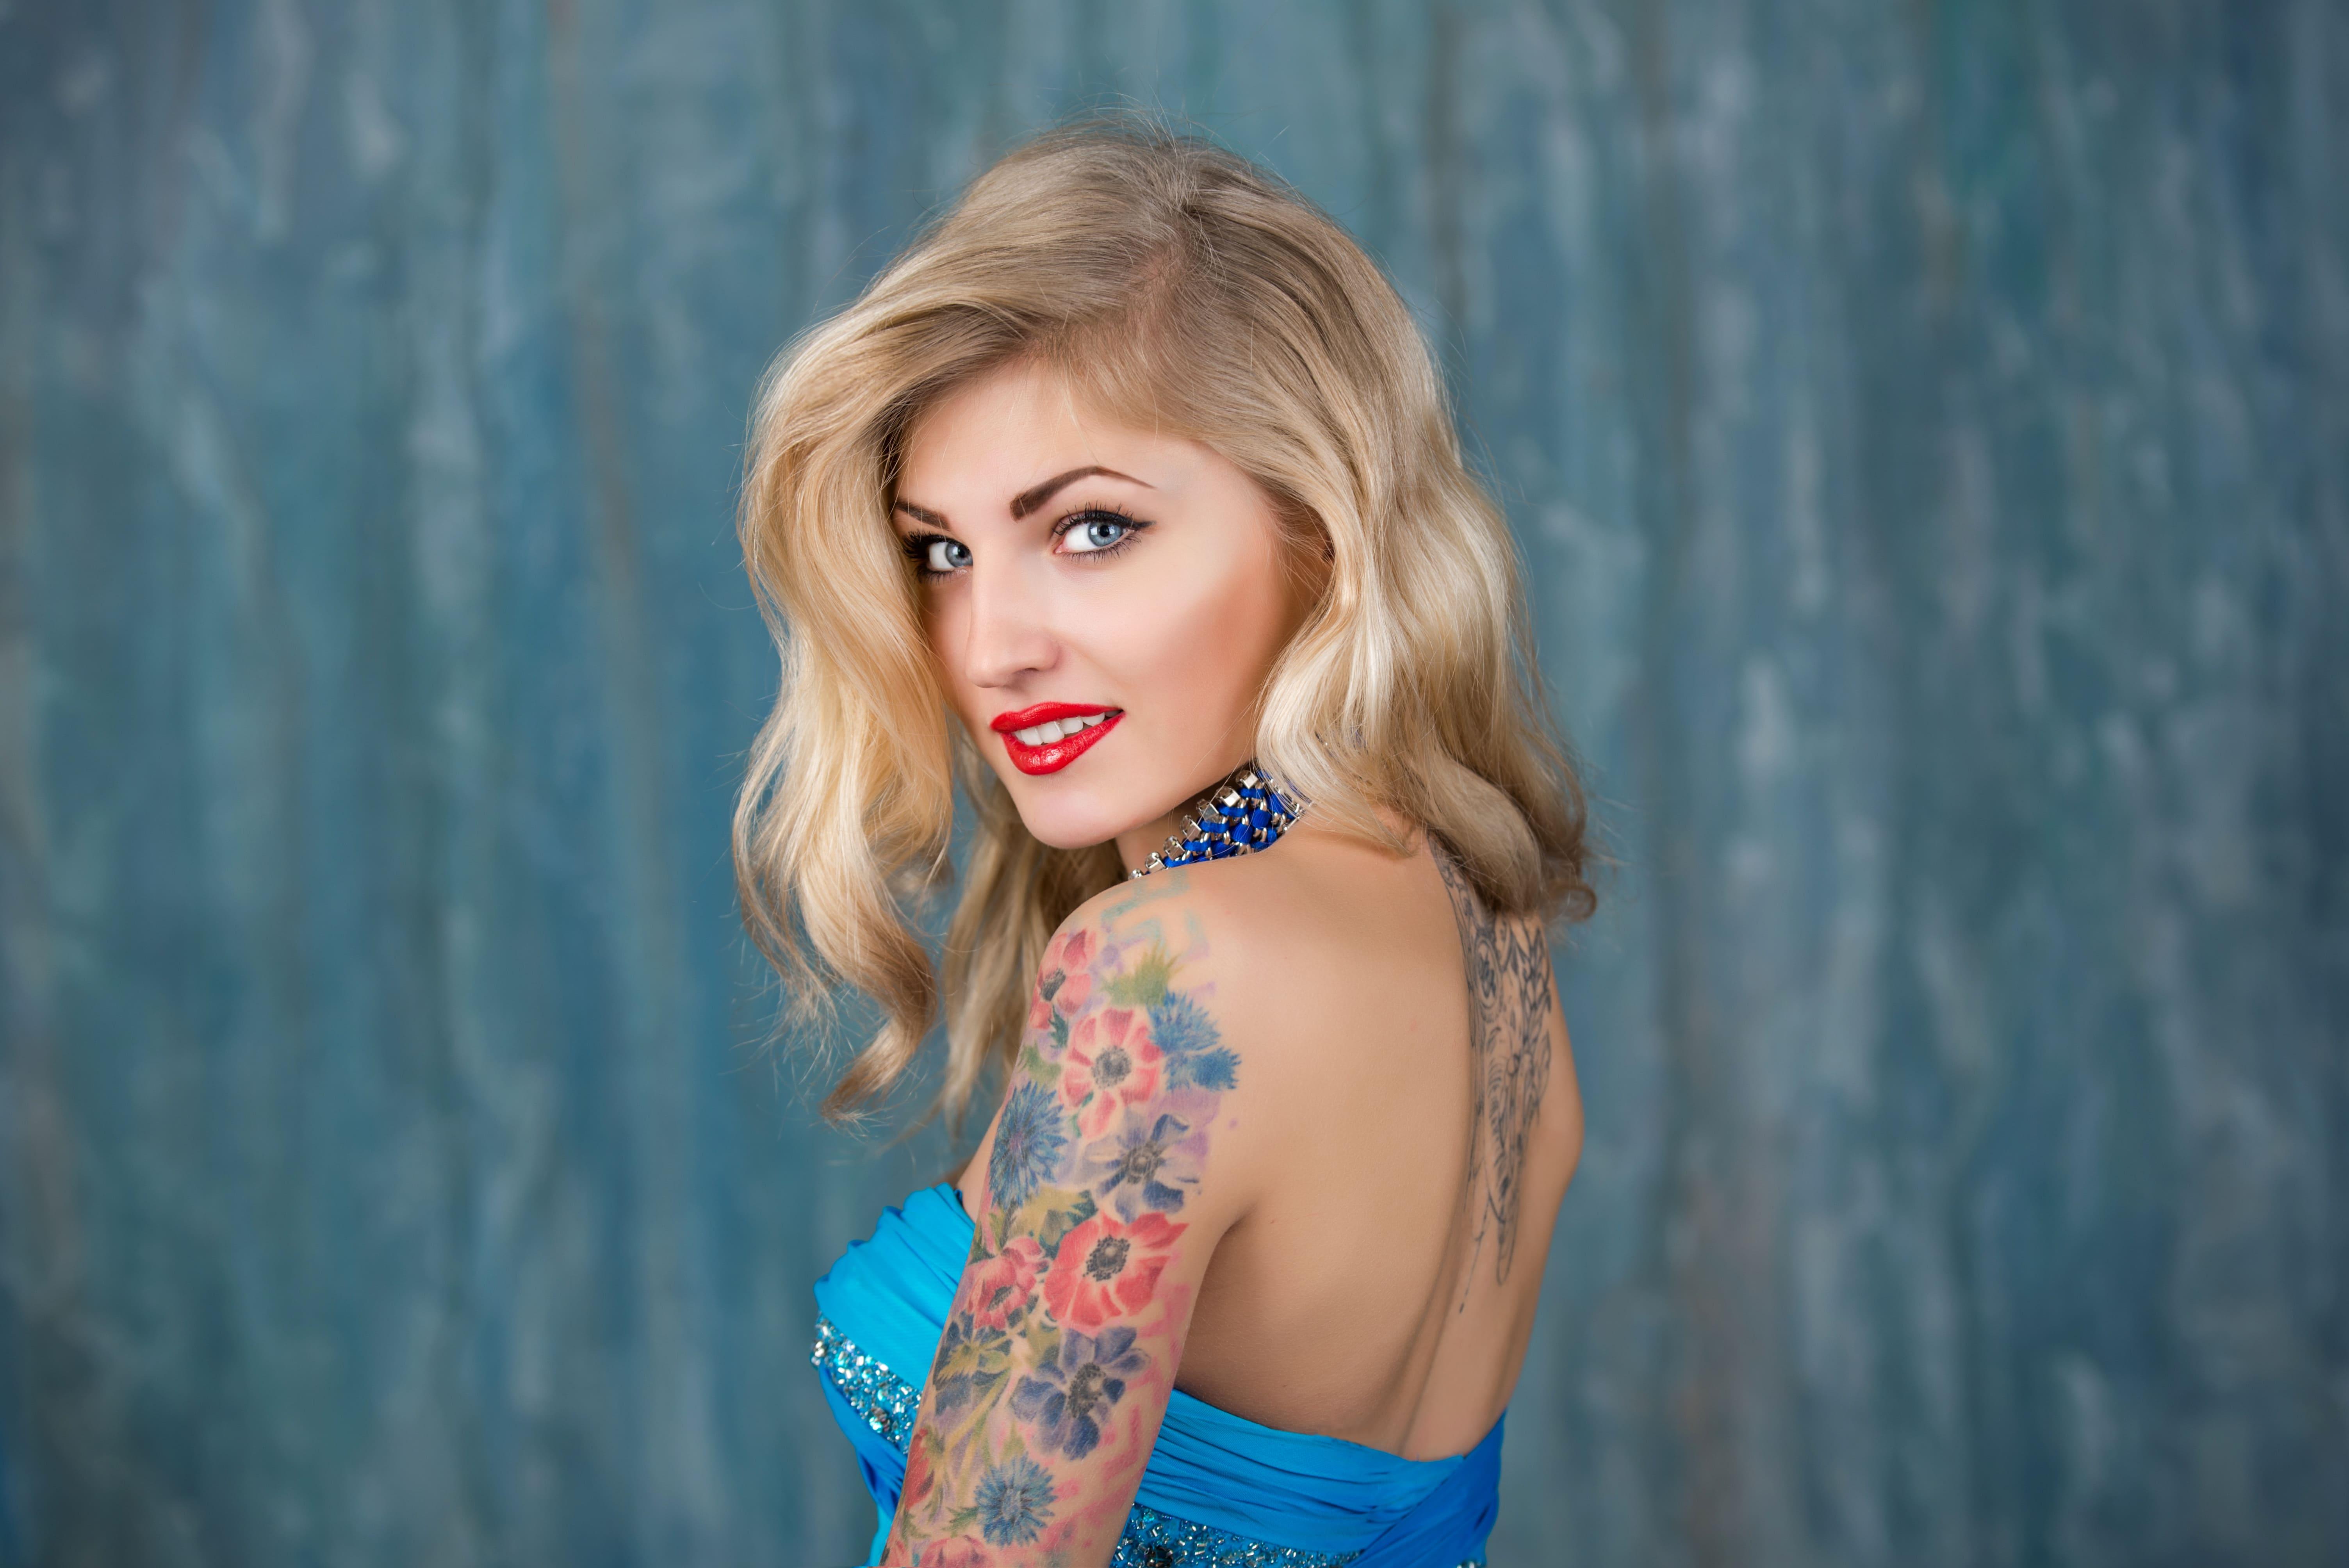 Tattoo Design Ideas for Girls - 17